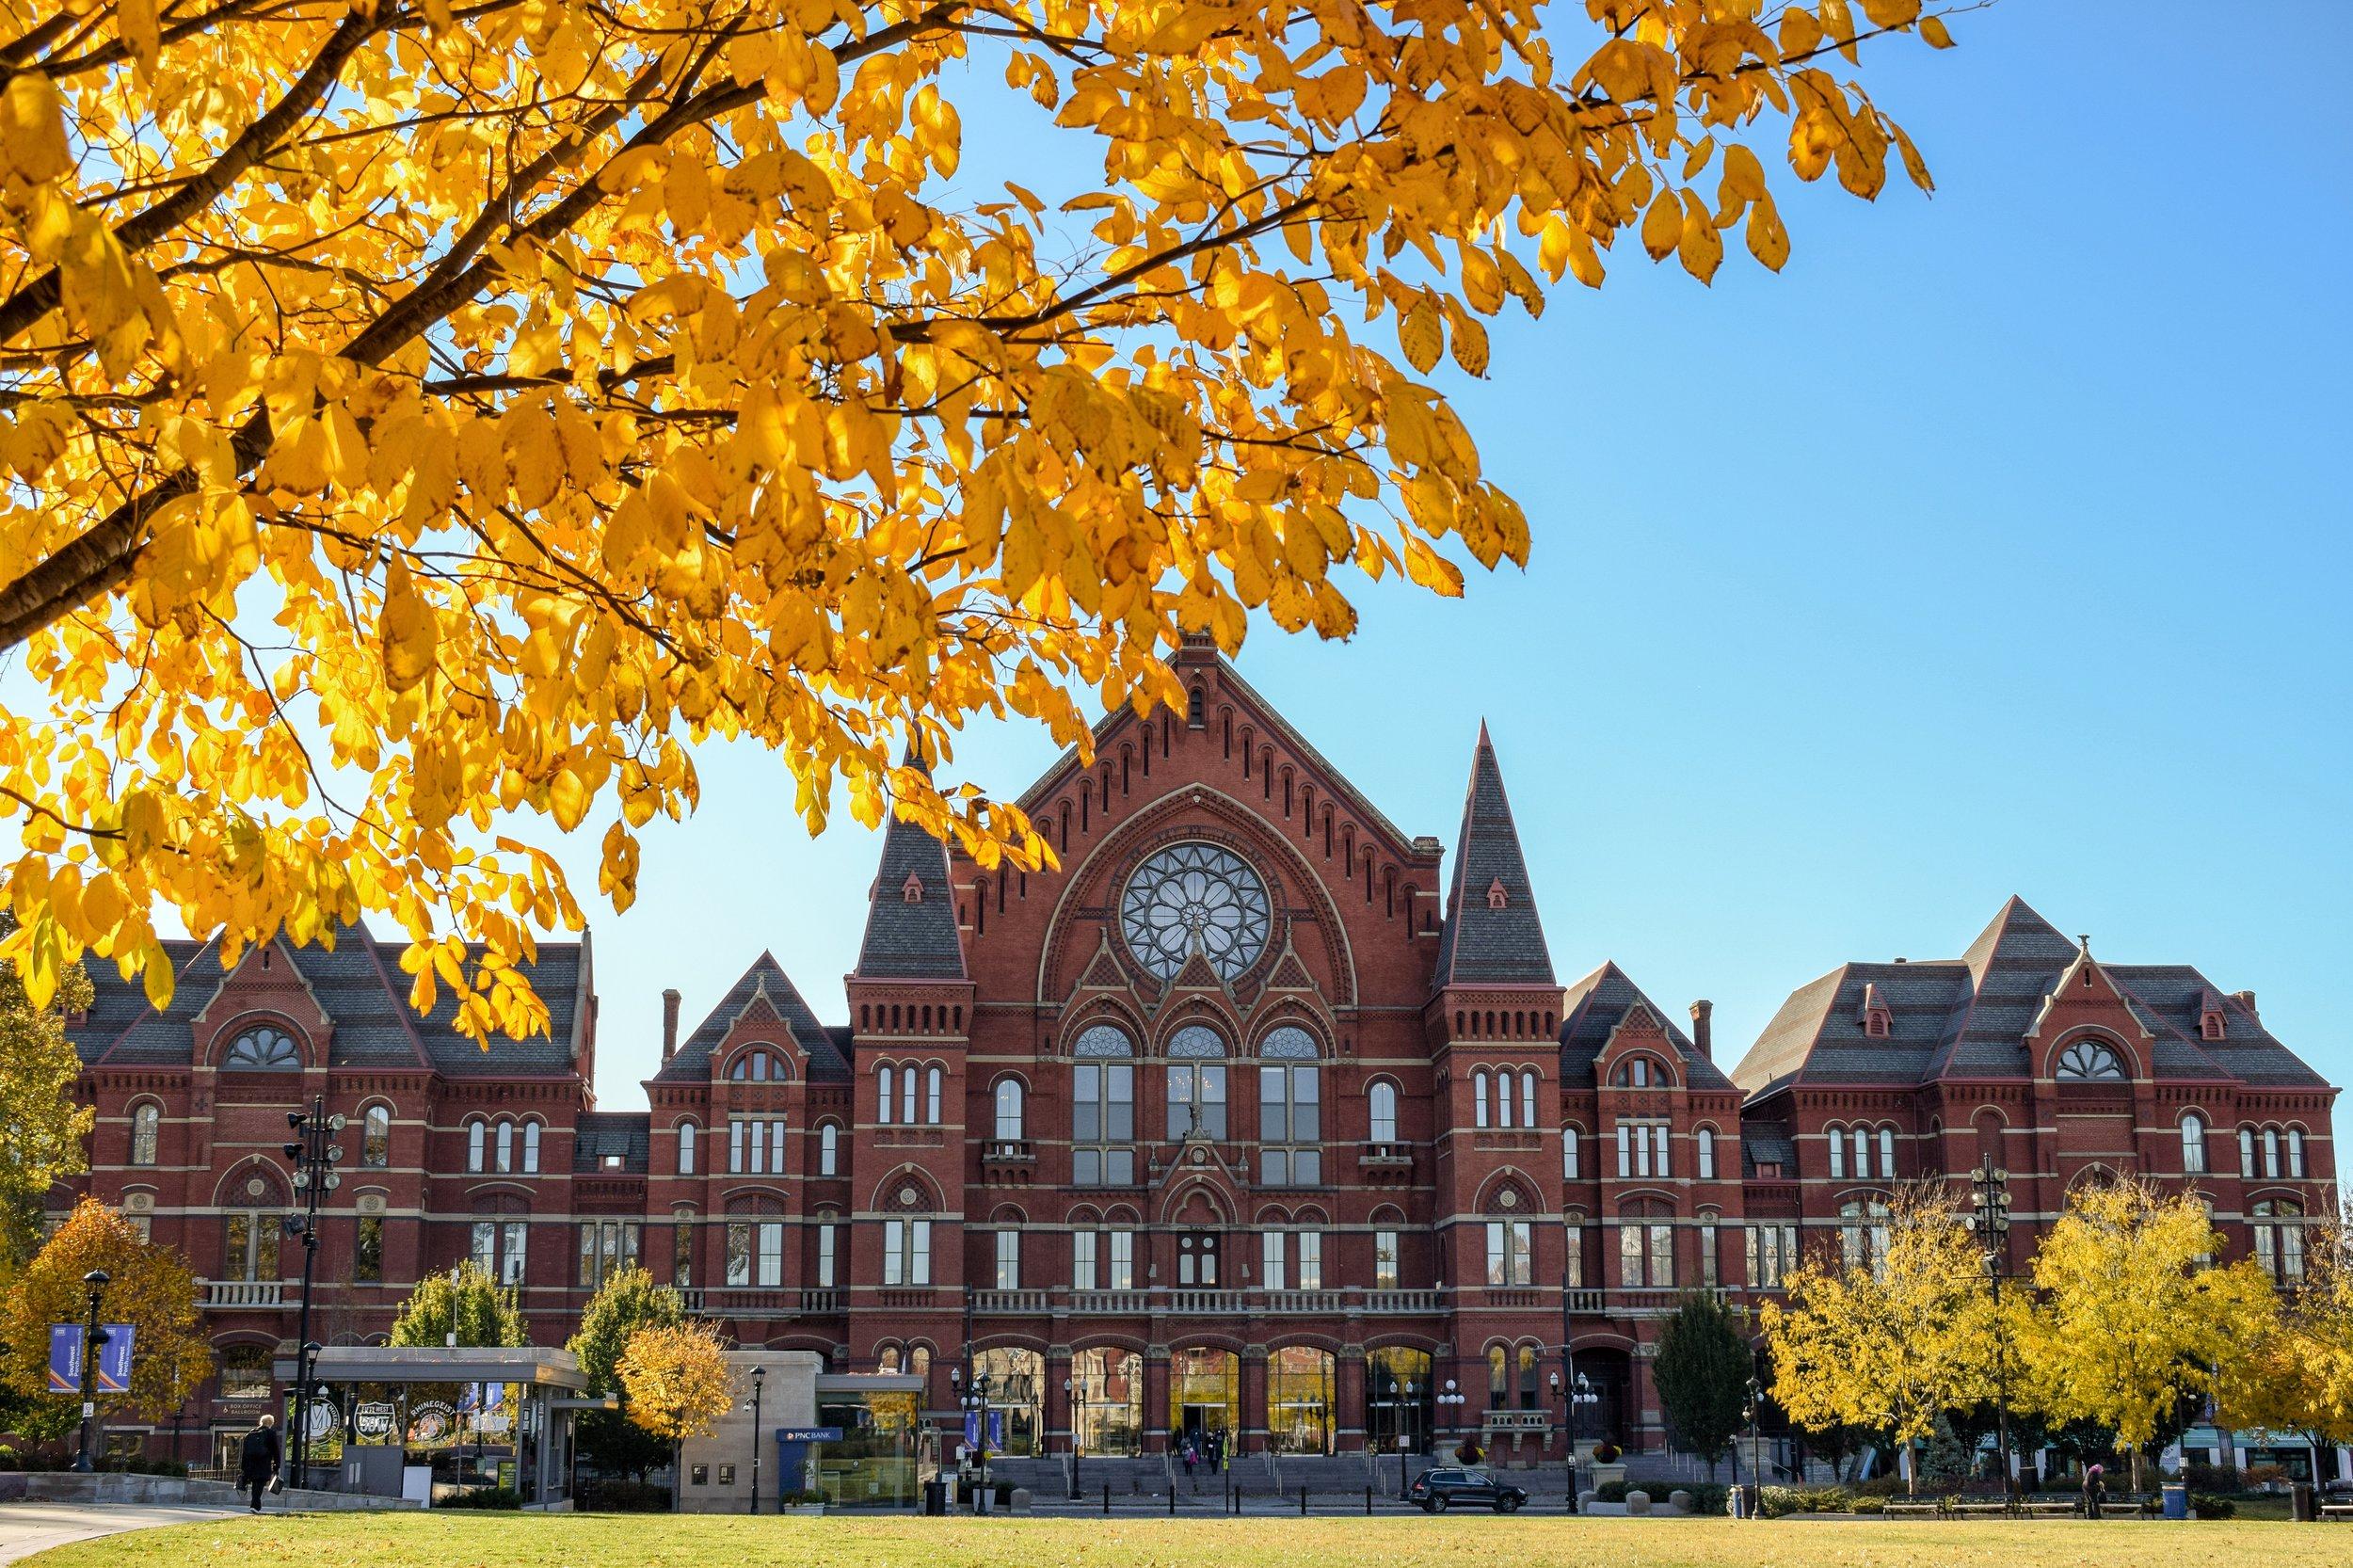 Listen to the sounds of the  Cincinnati Symphony Orchestra ,  Cincinnati Opera , and more inside historic  Music Hall .